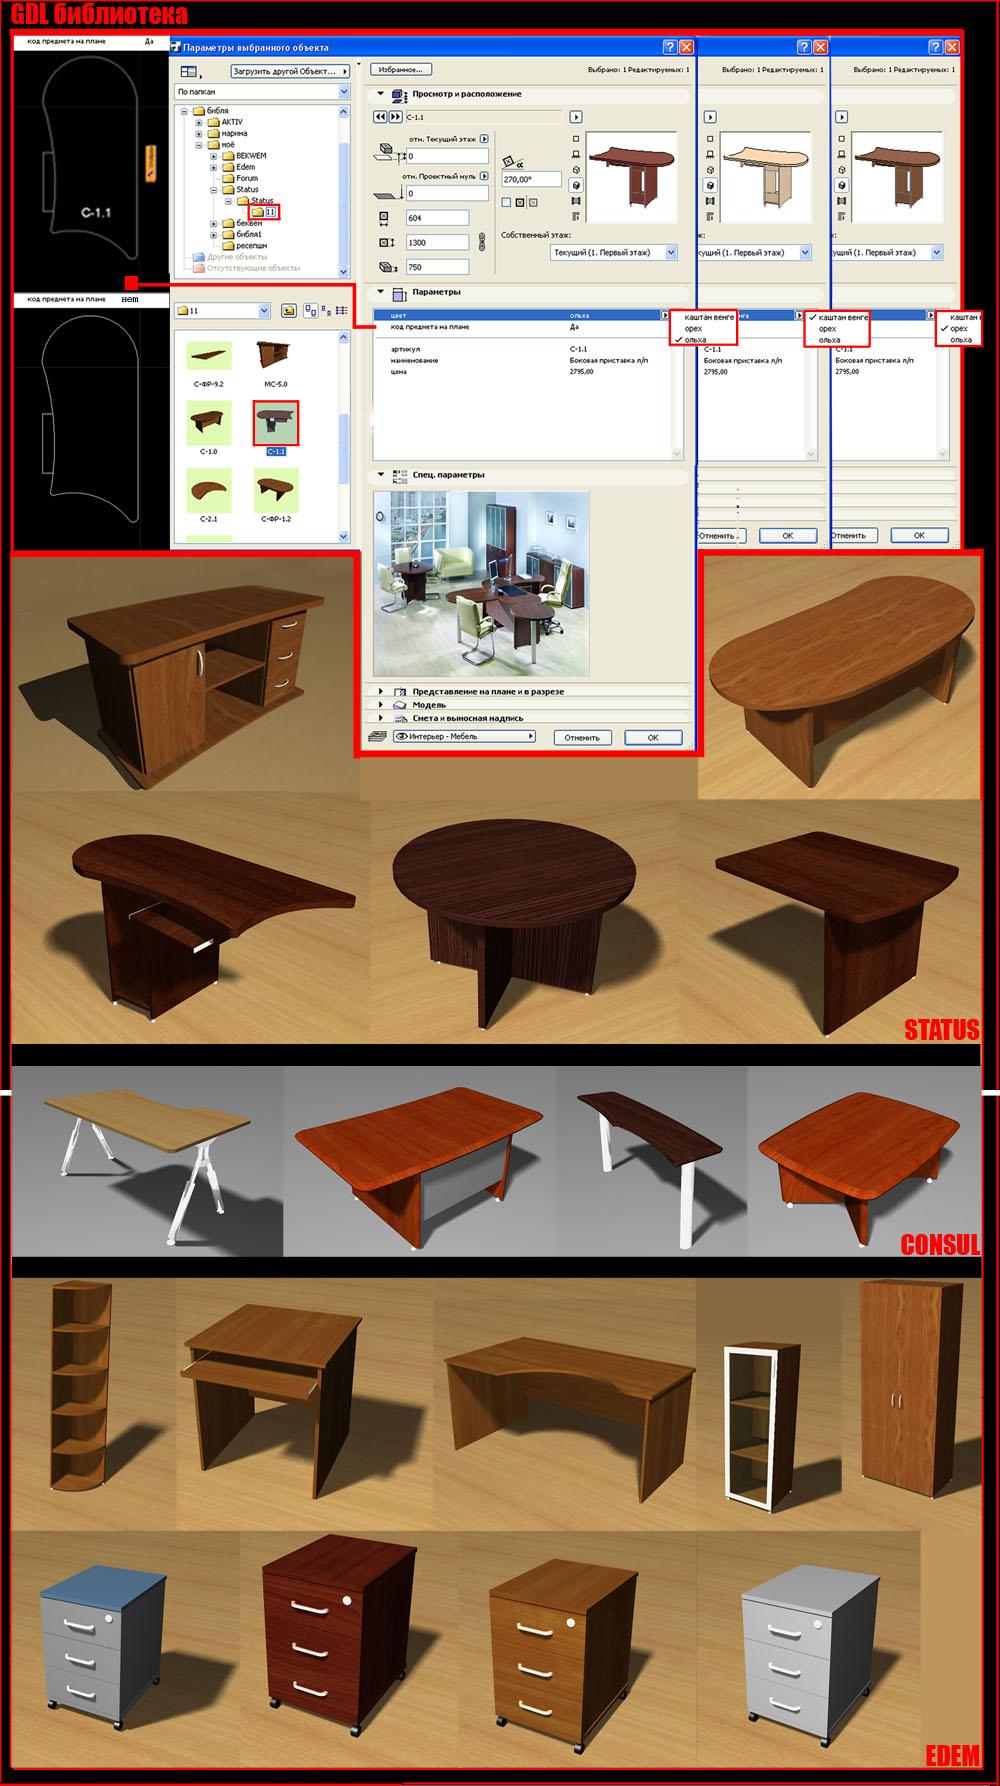 ... Дарья Бычкова [kbch] | Библиотека мебели: free-lancers.net/users/kbch/projects/203841